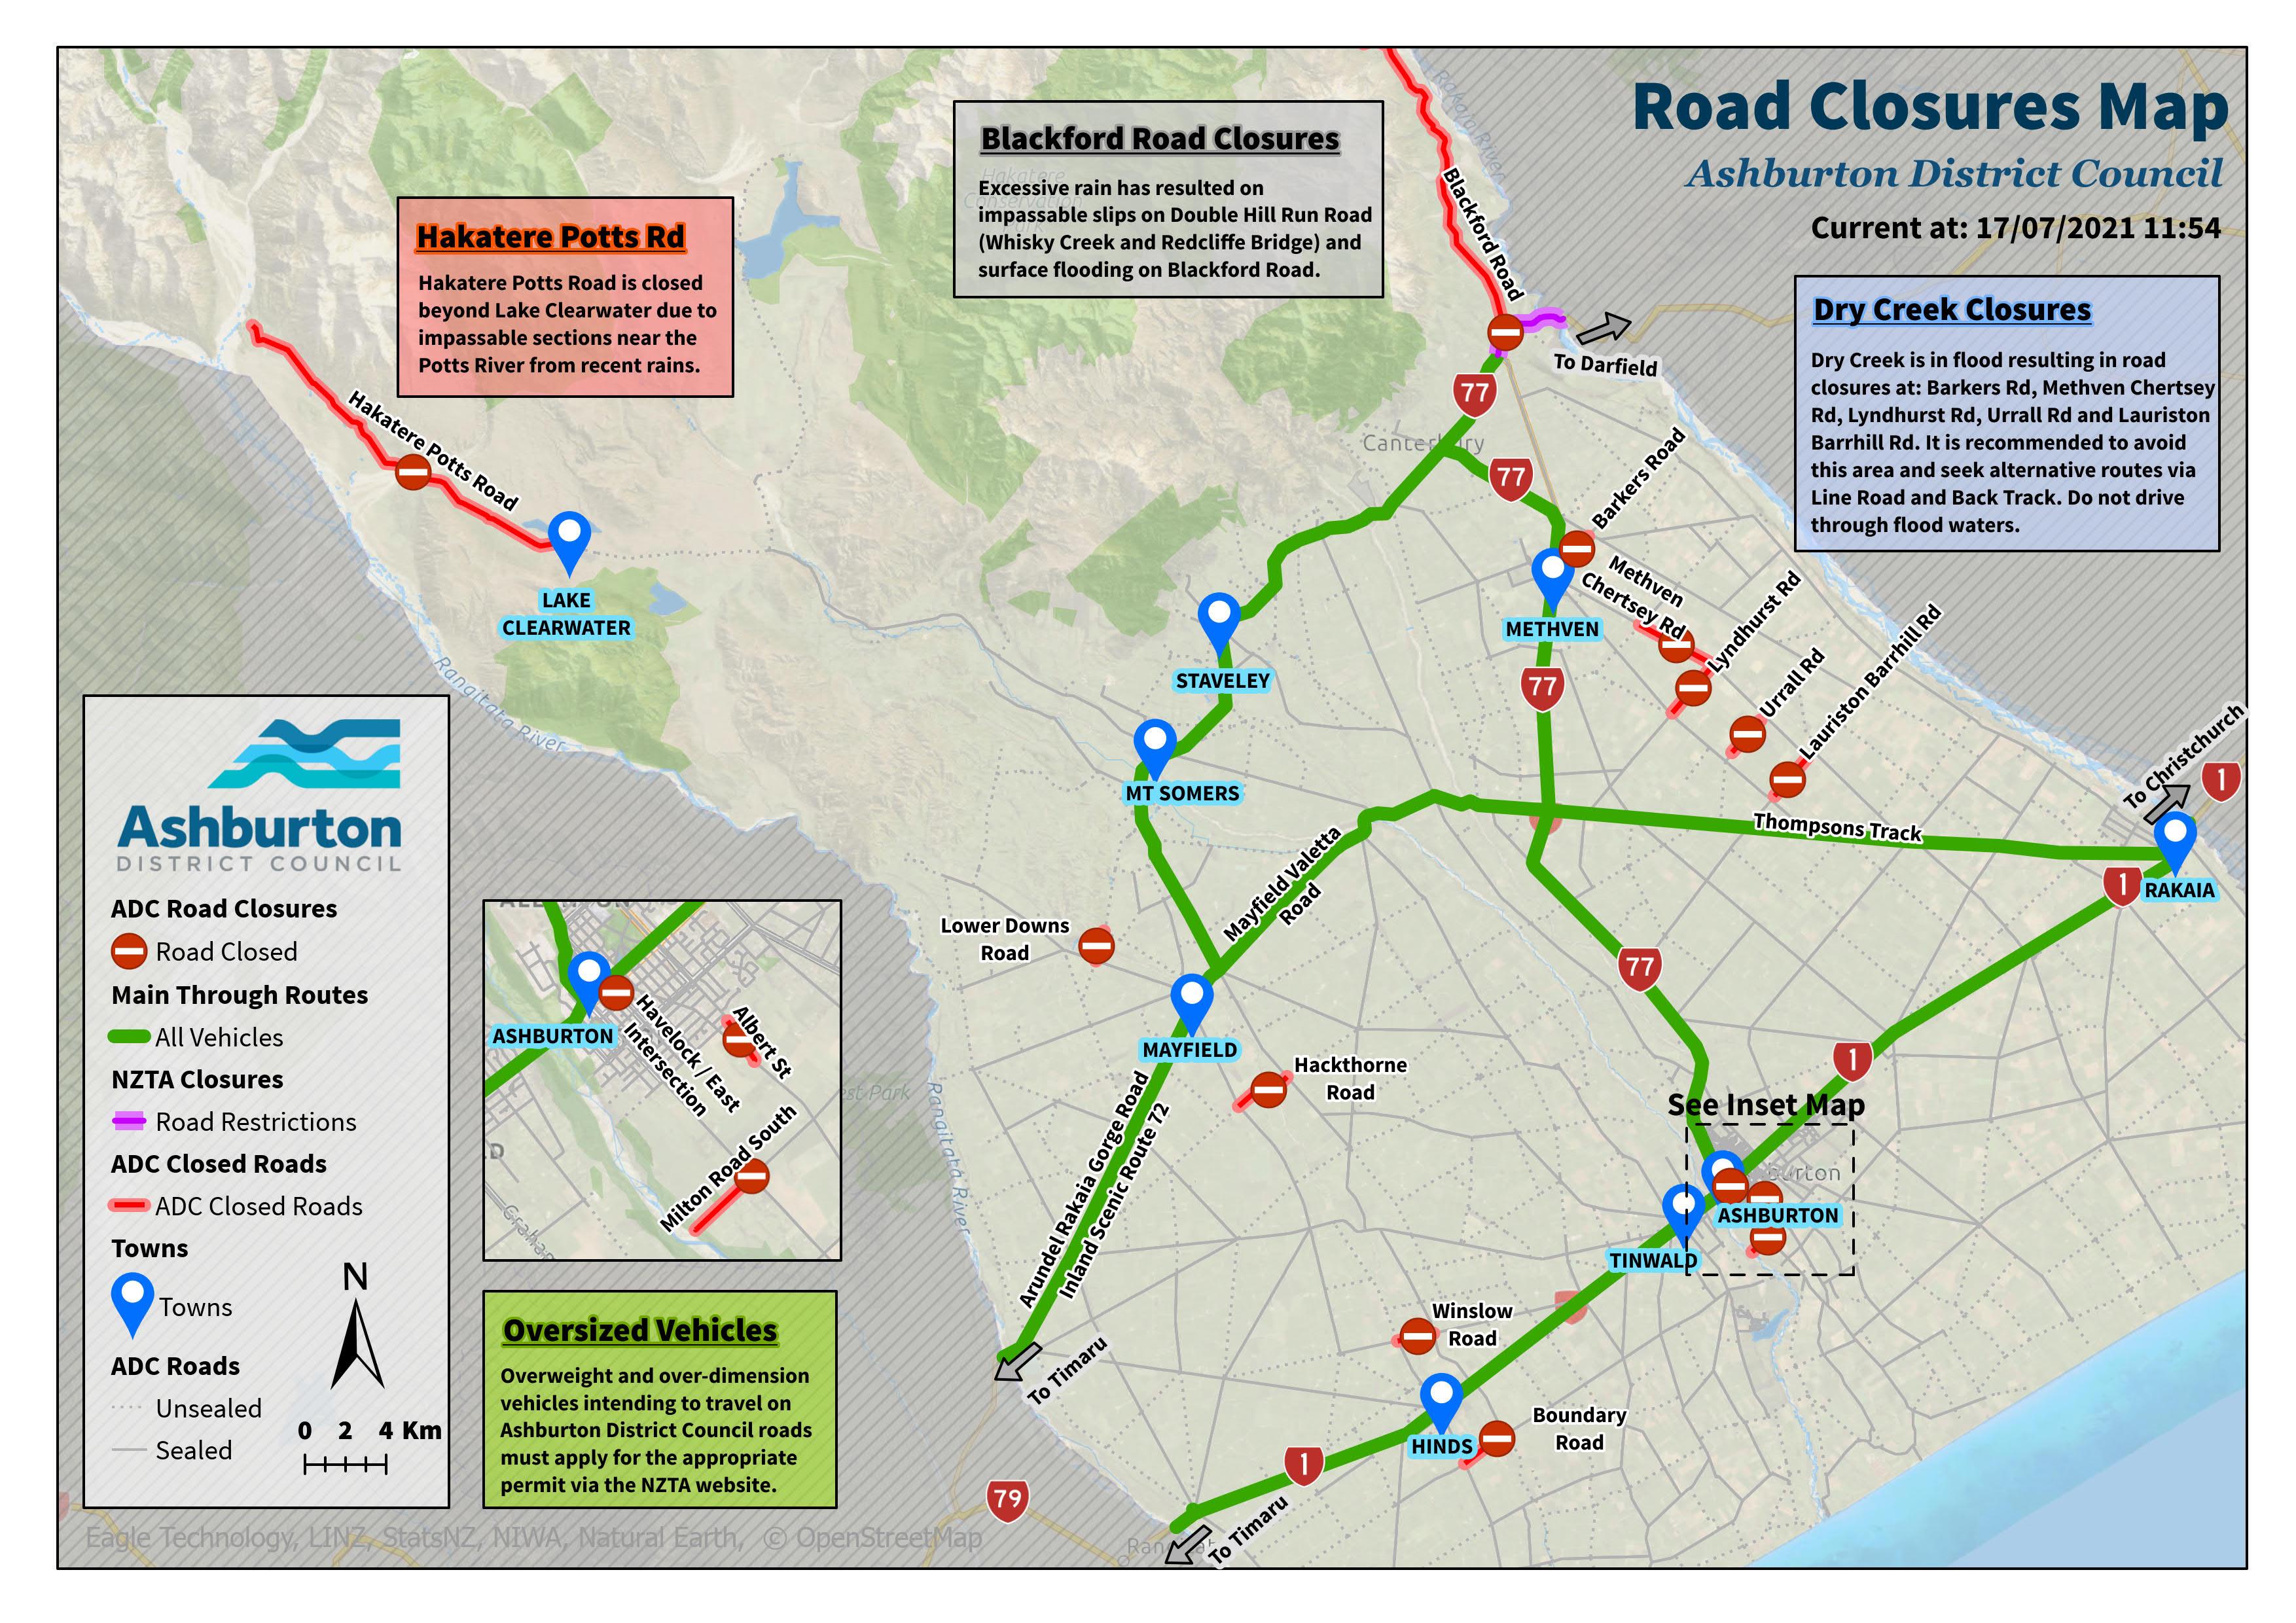 ADC Road Closures Map